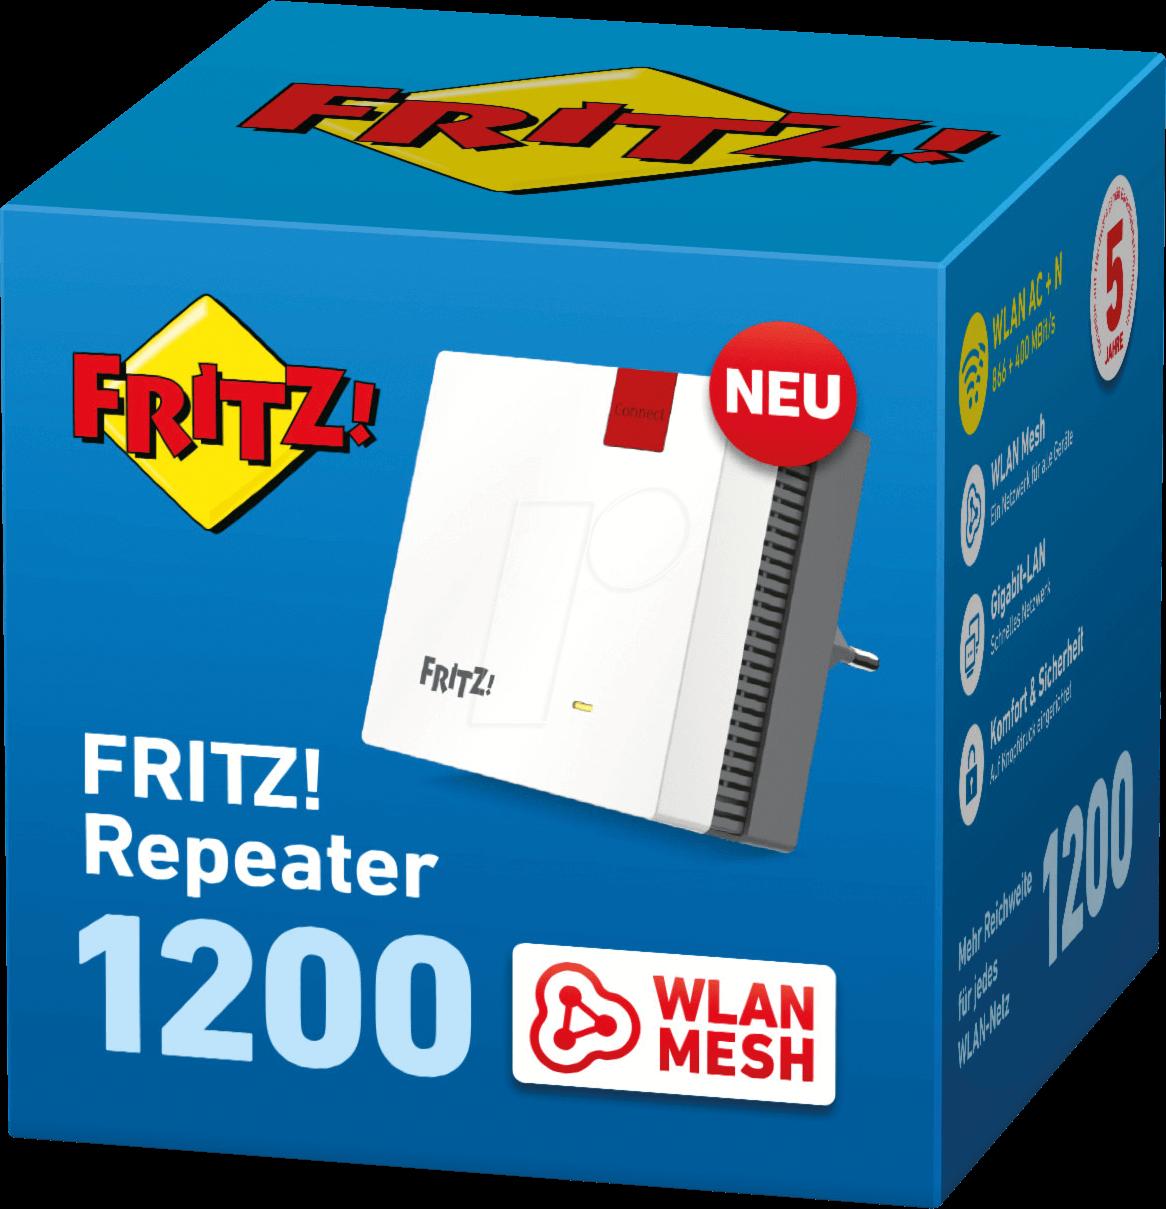 AVM FRW 20 AVM FRITZWLAN Mesh Repeater 20 bei reichelt ...